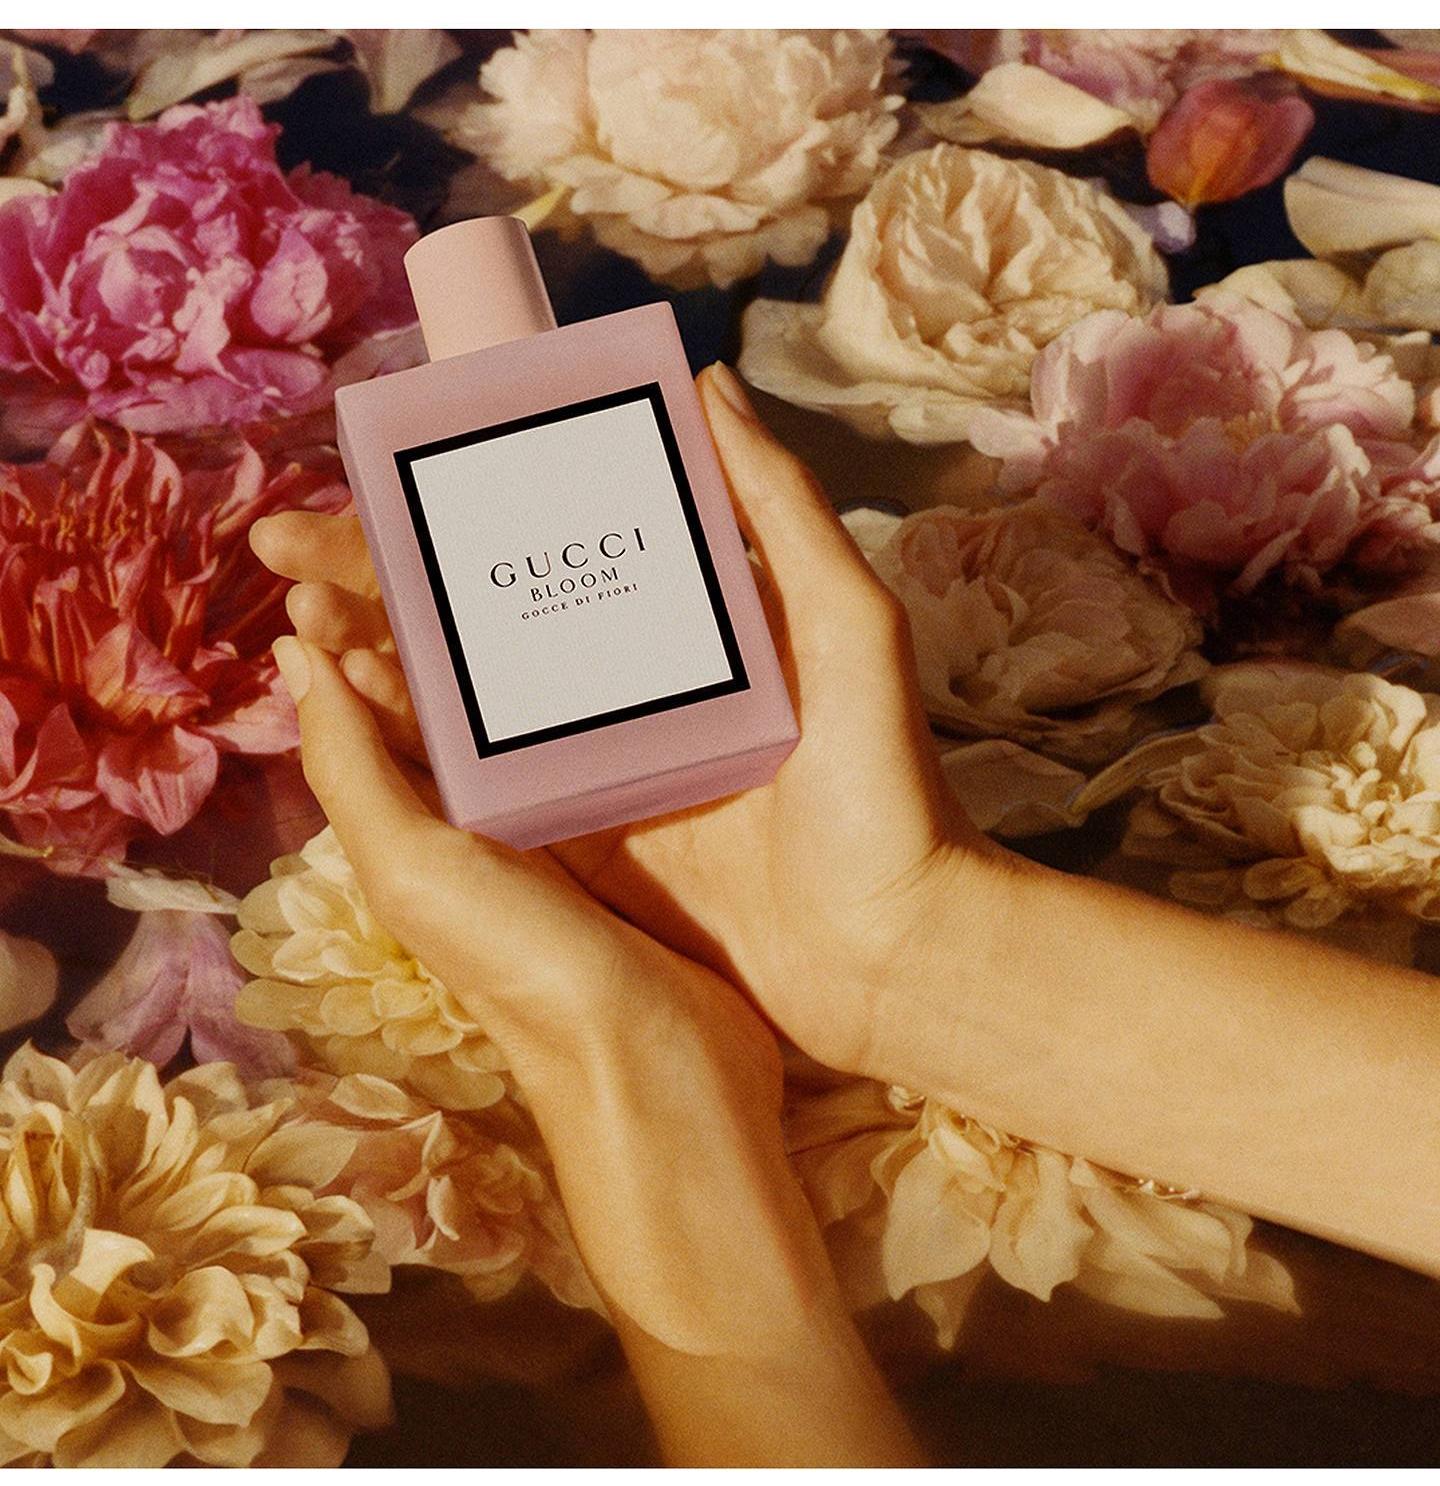 Gucci-Bloom-Gocce-di-Fiori-Banner-01